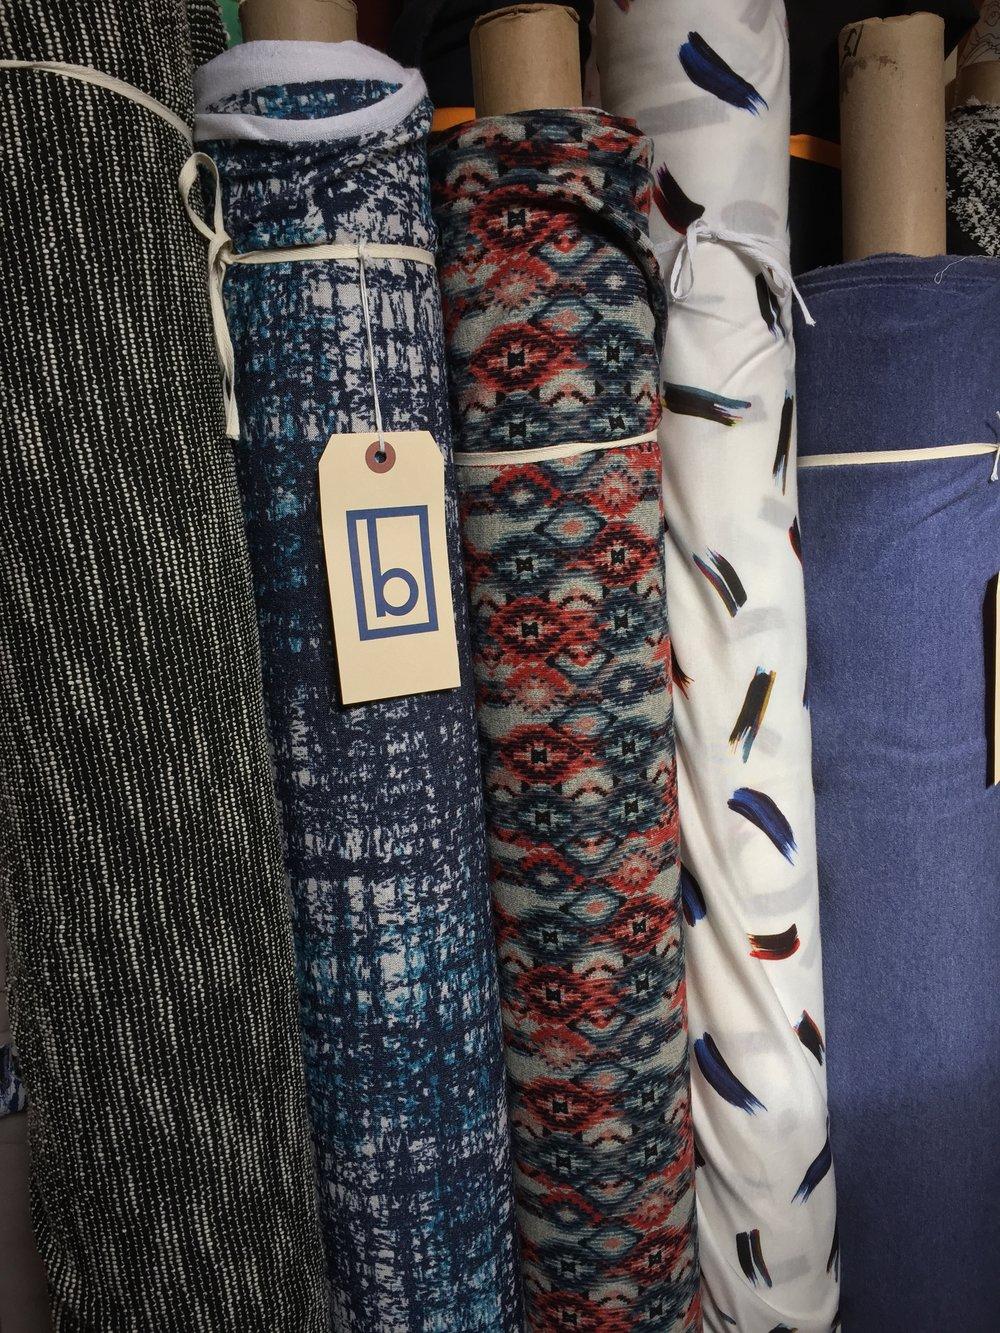 jomar knits.JPG